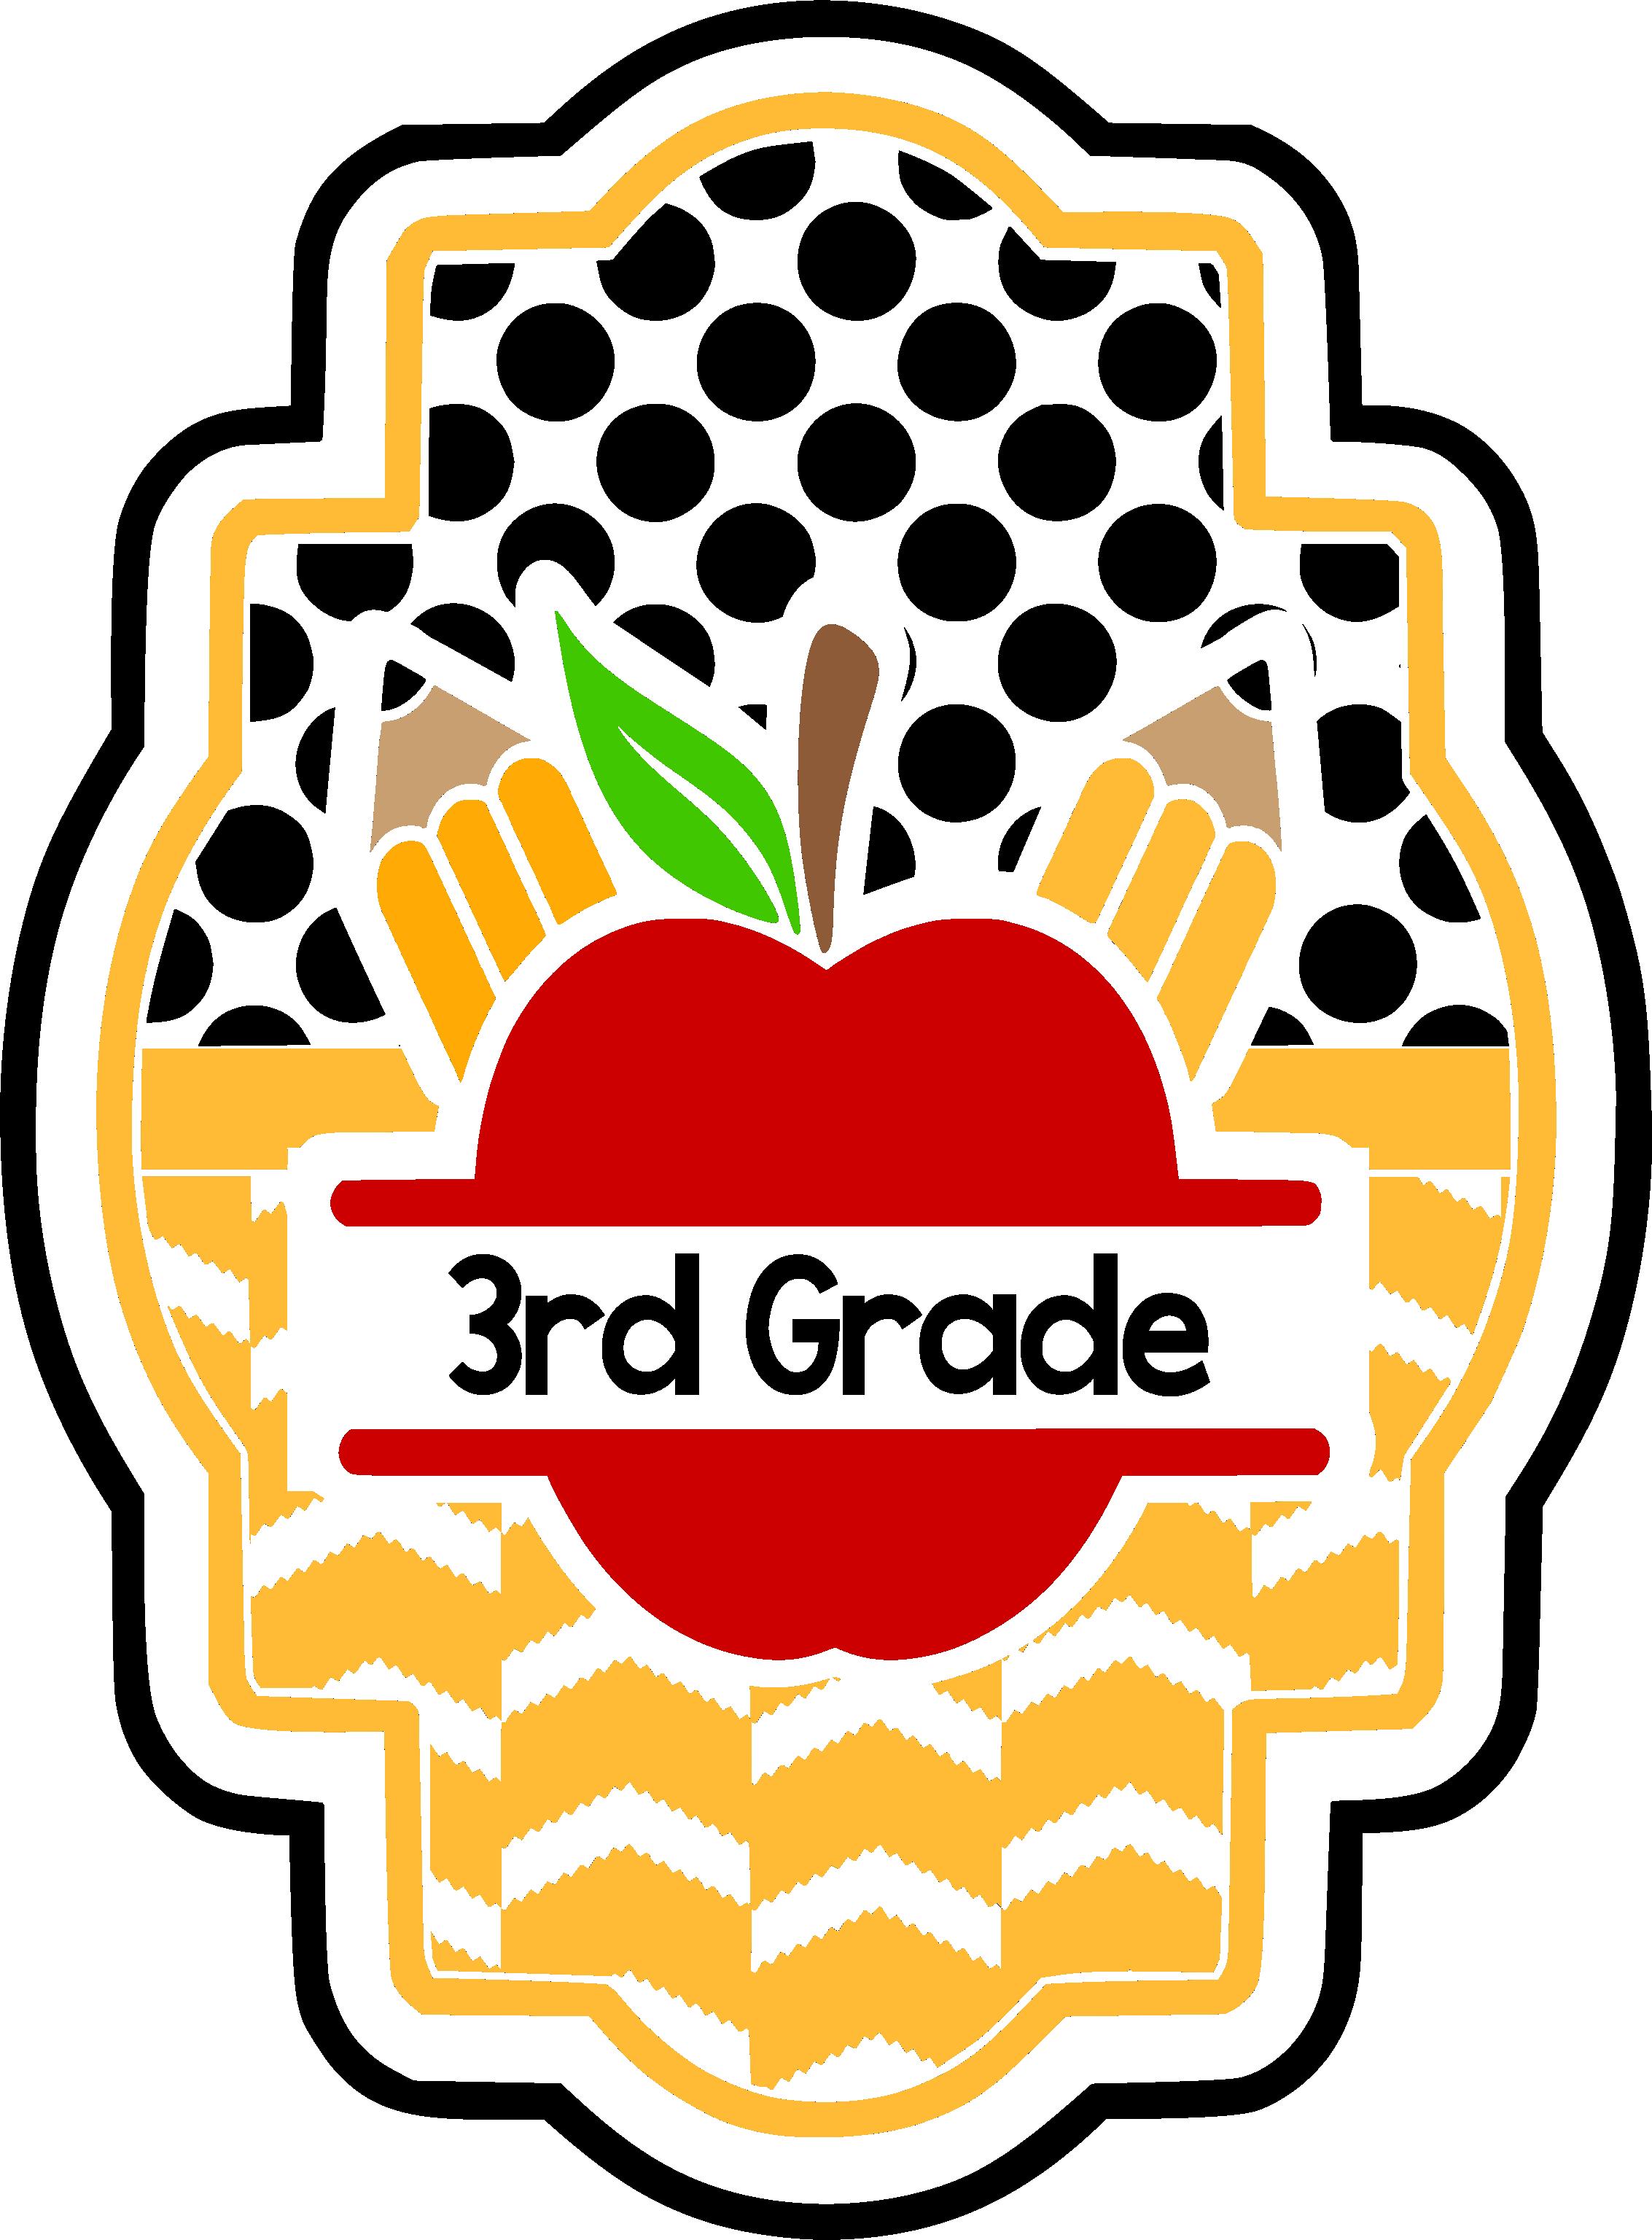 School Apple Pattern 3rd grade Graphic design software